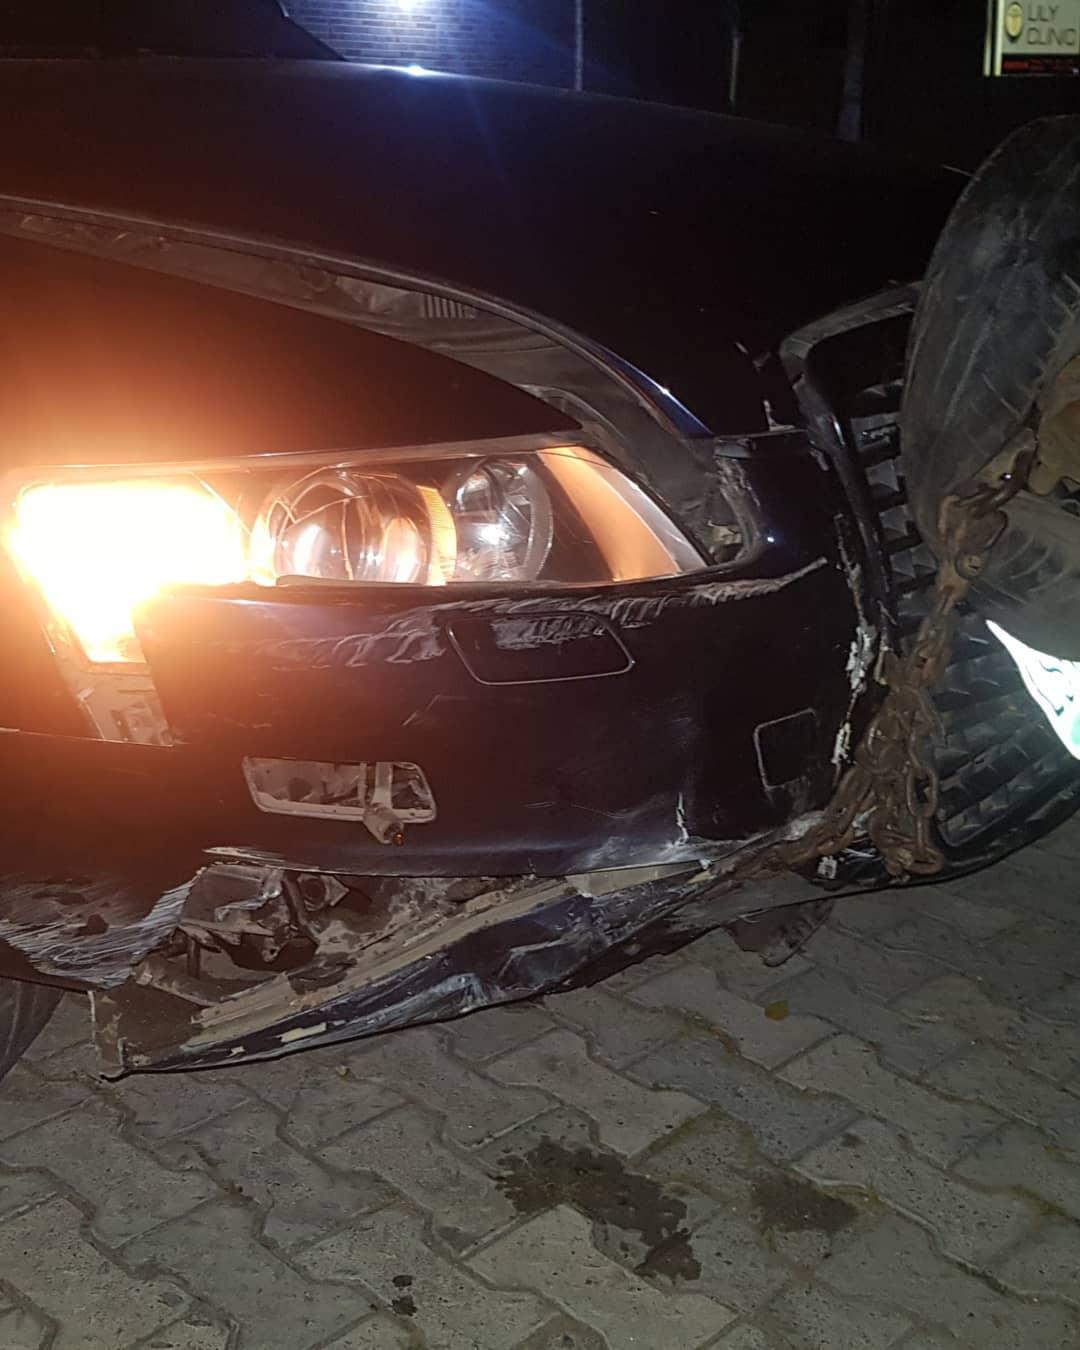 Liz John Black survives ghastly accident in Lagos